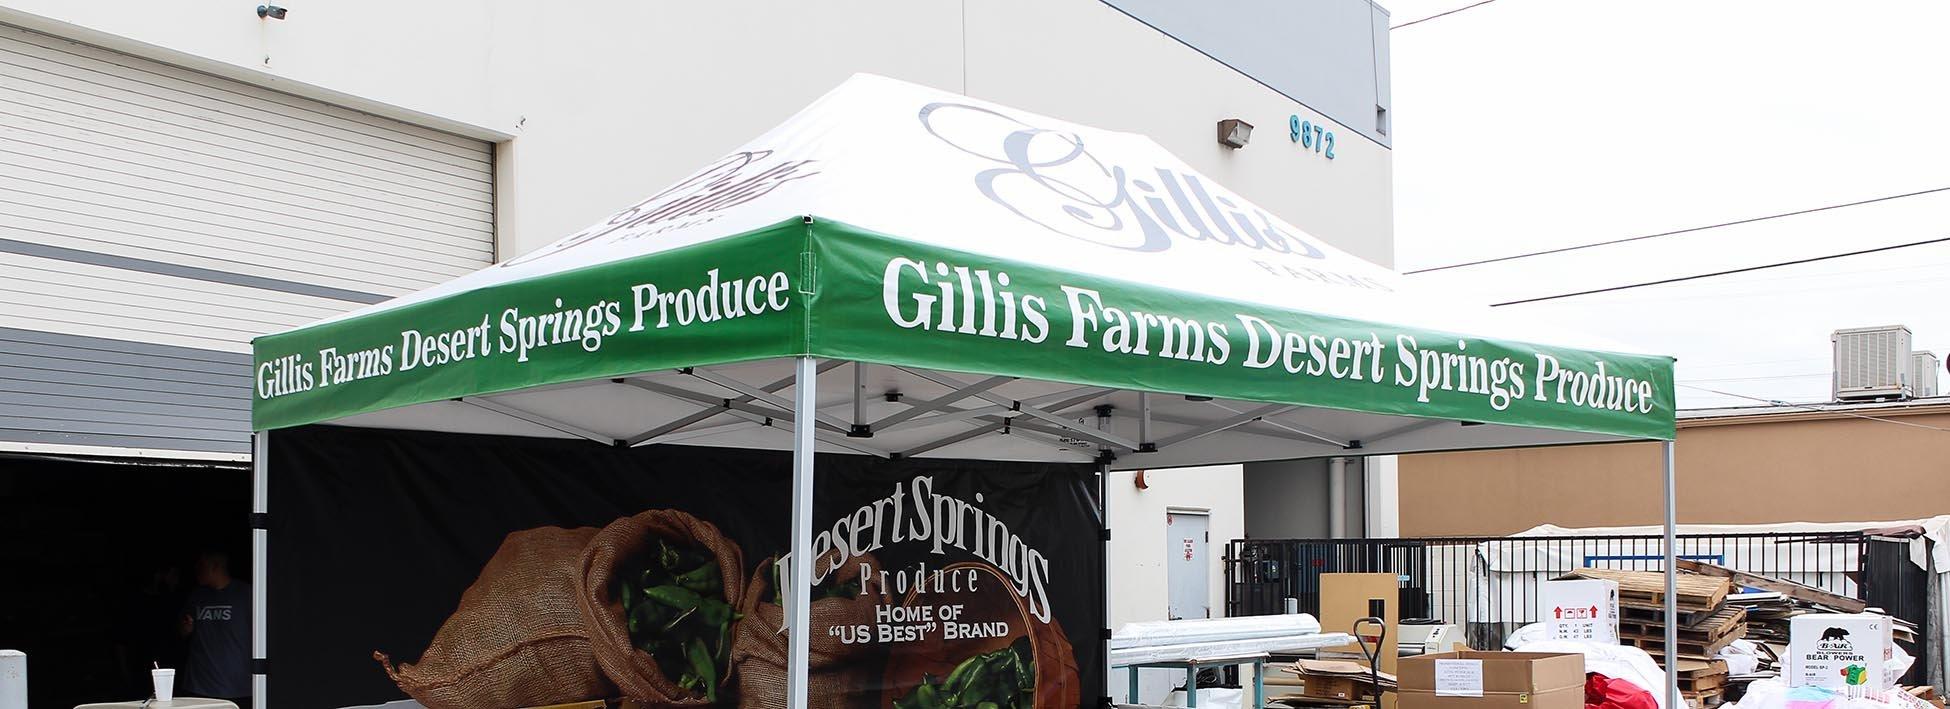 gillis-farms-header.jpg